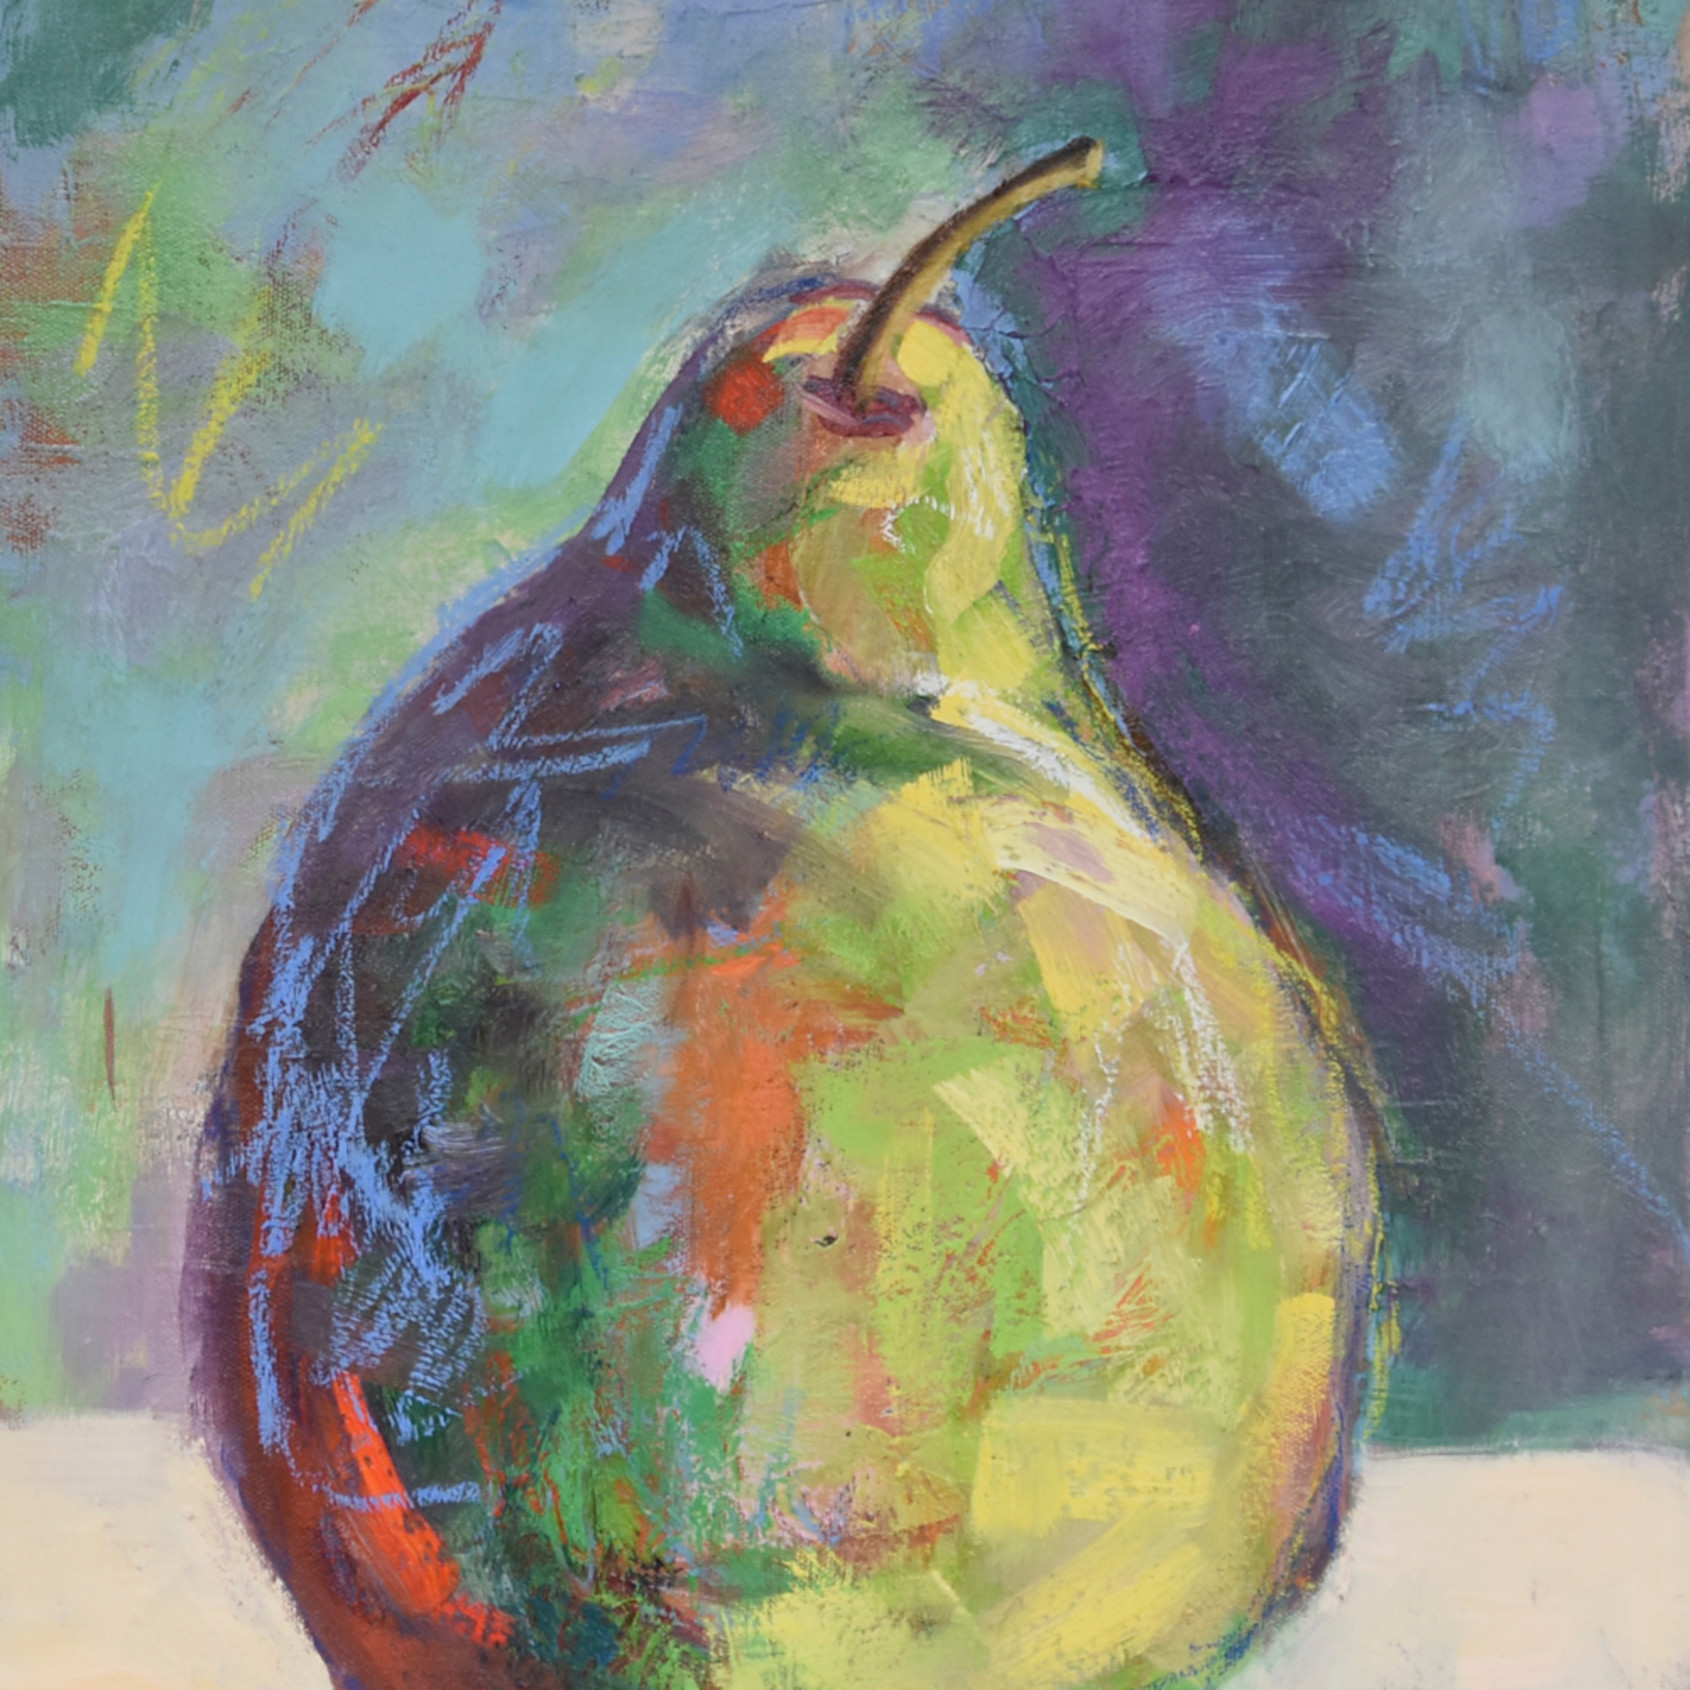 One single pear olt842